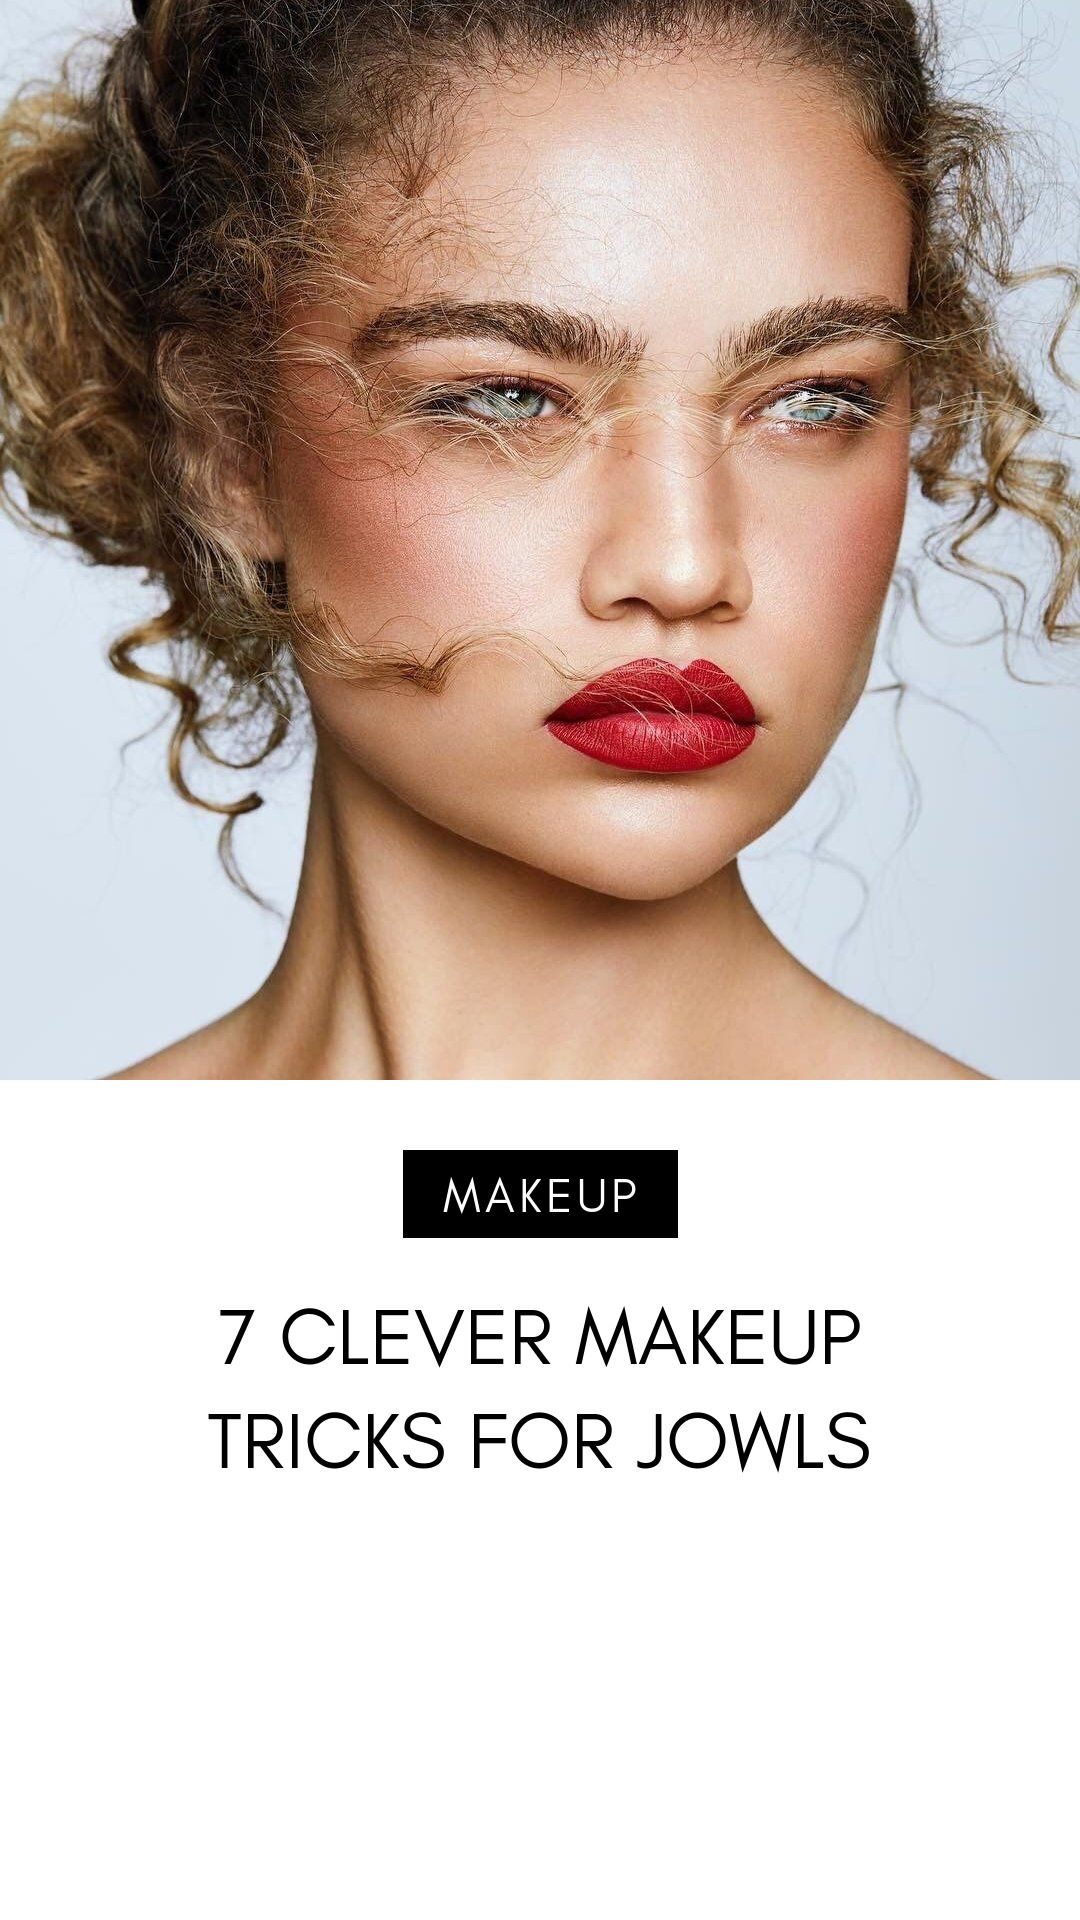 12 Clever Makeup Tricks for Jowls   Makeup tips, Jowls makeup, Jowl